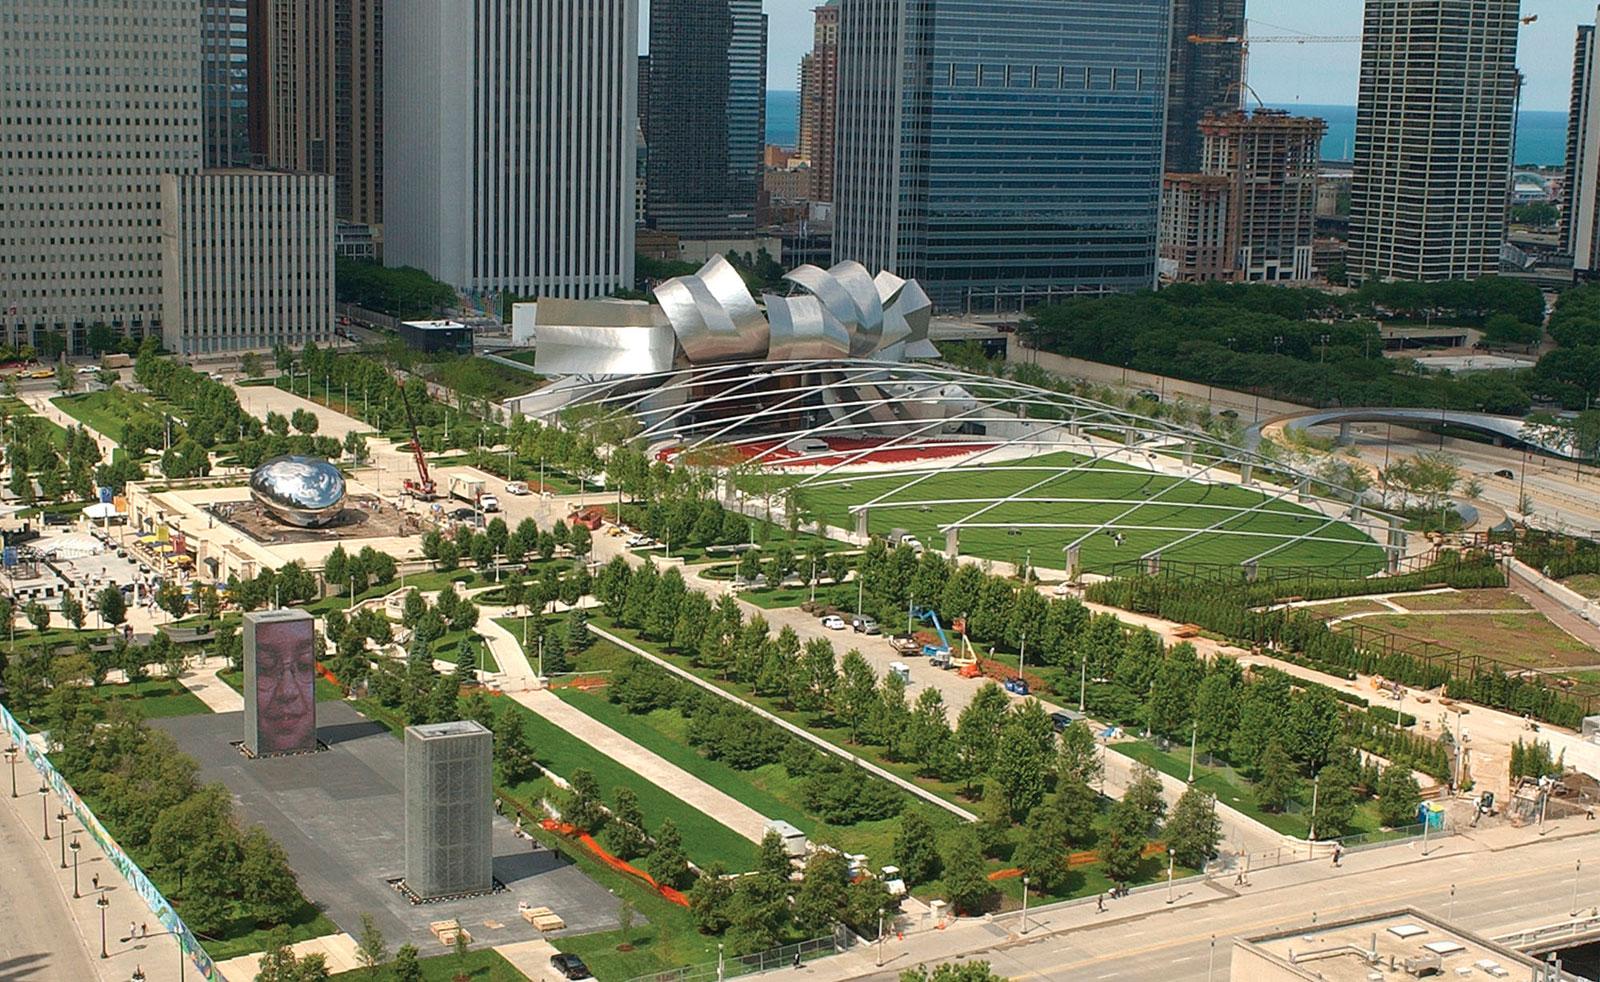 millennium park in chicago. Black Bedroom Furniture Sets. Home Design Ideas